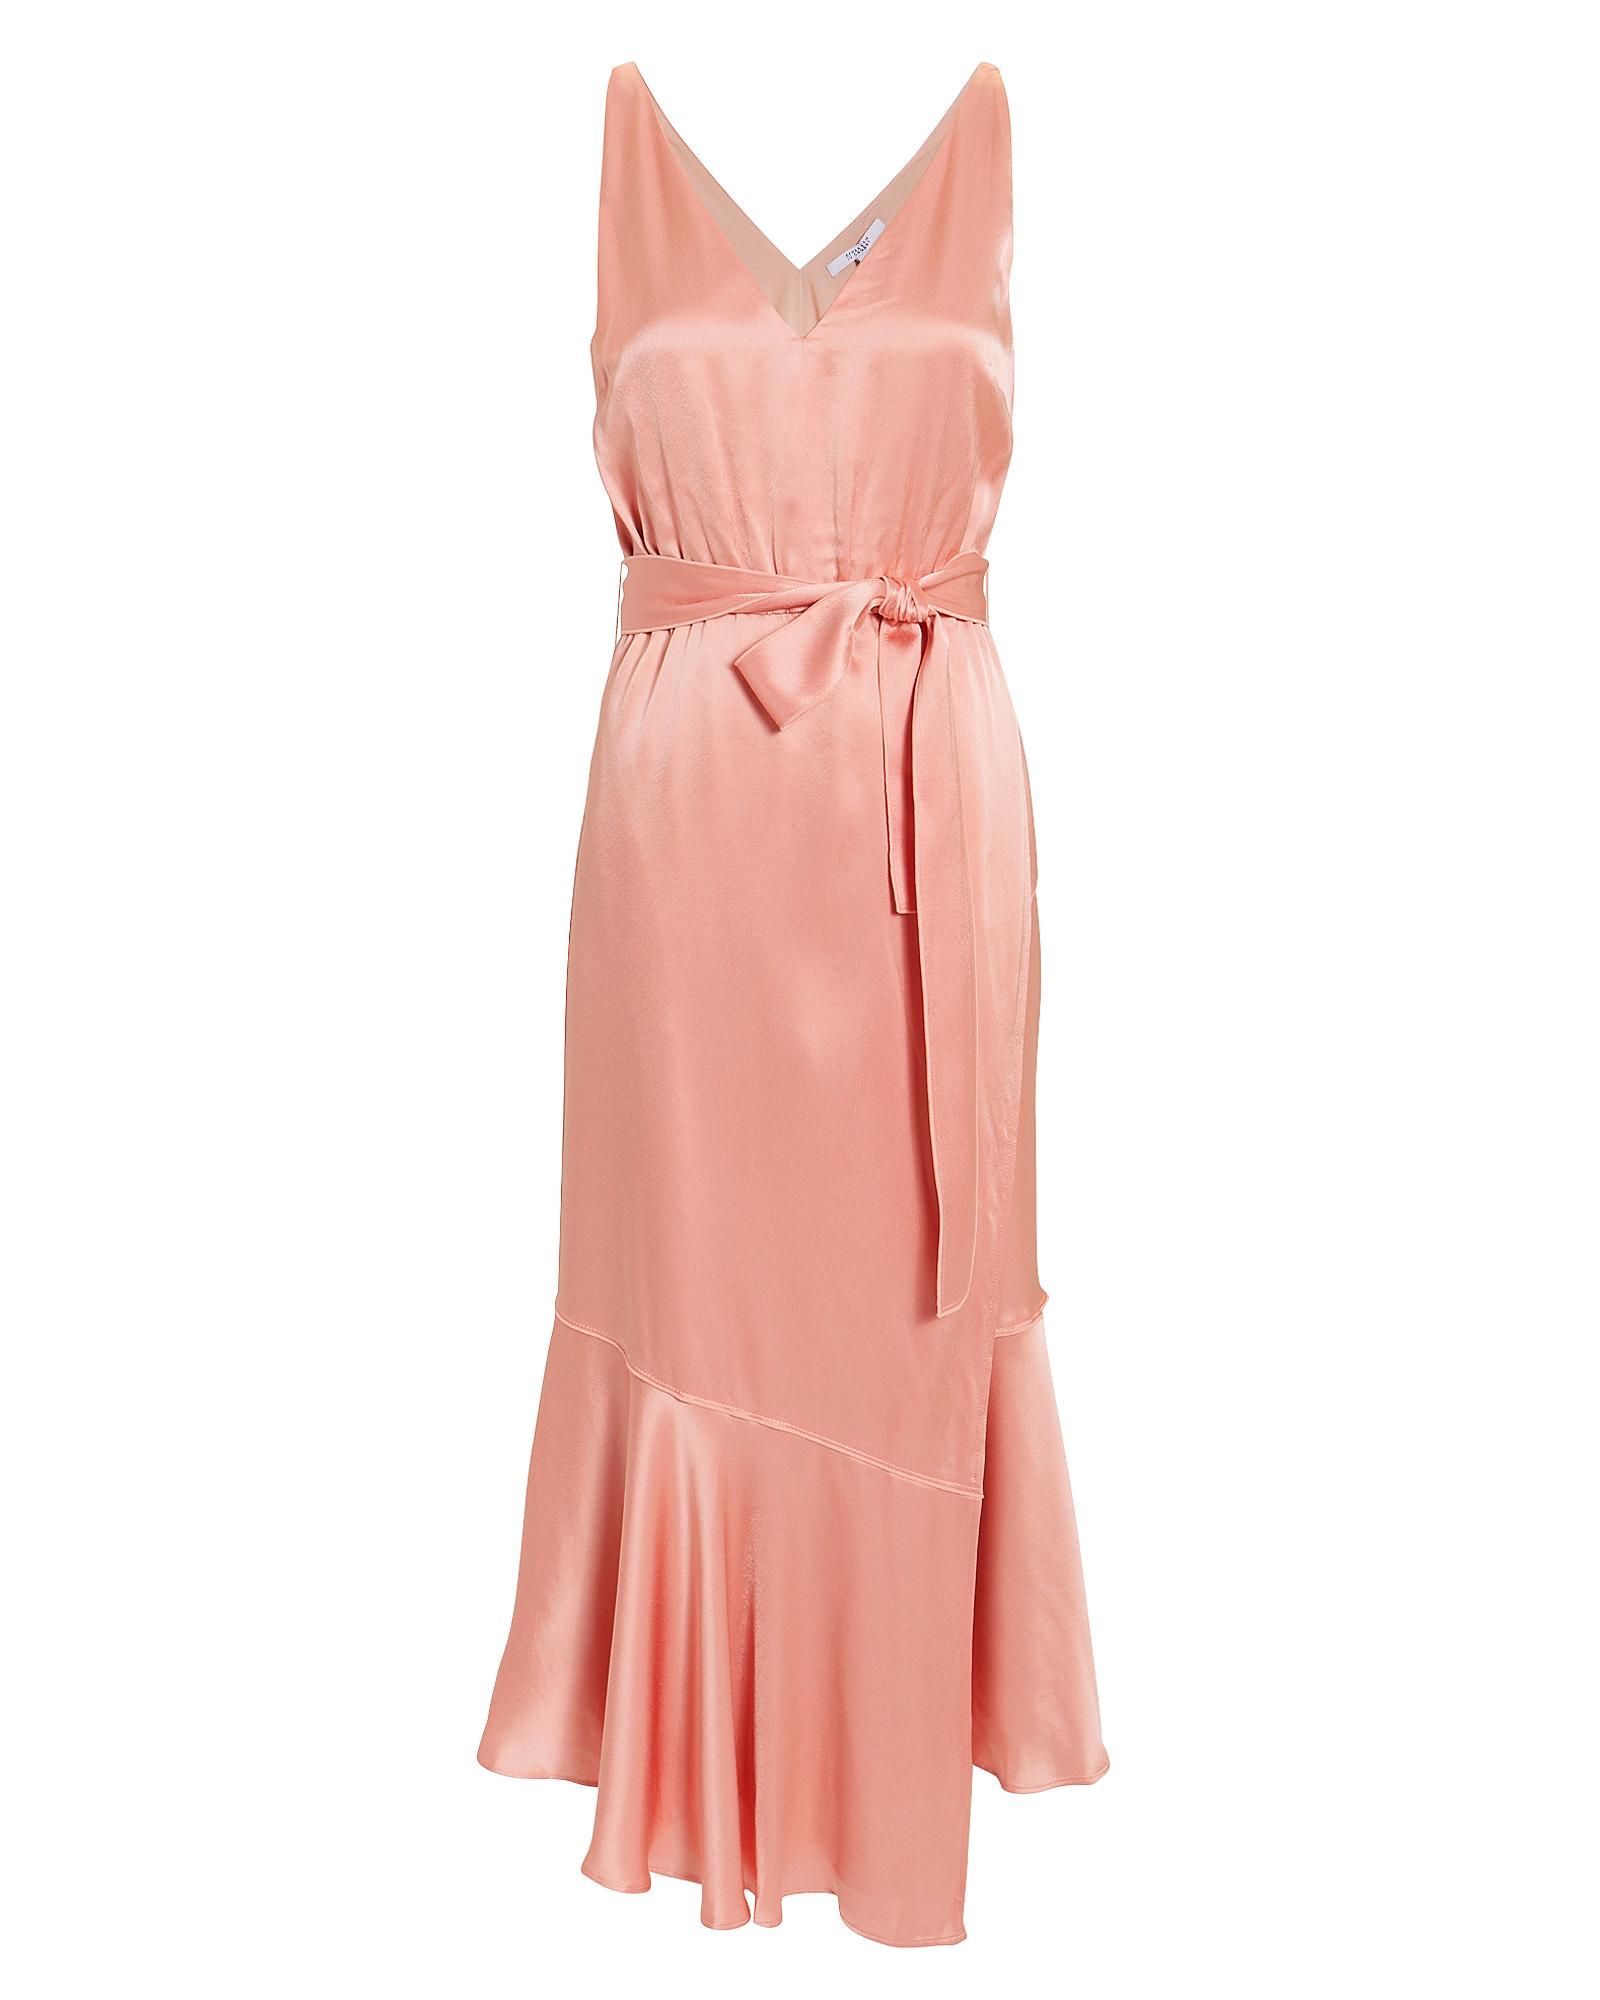 10 CROSBY Blush Satin Midi Dress